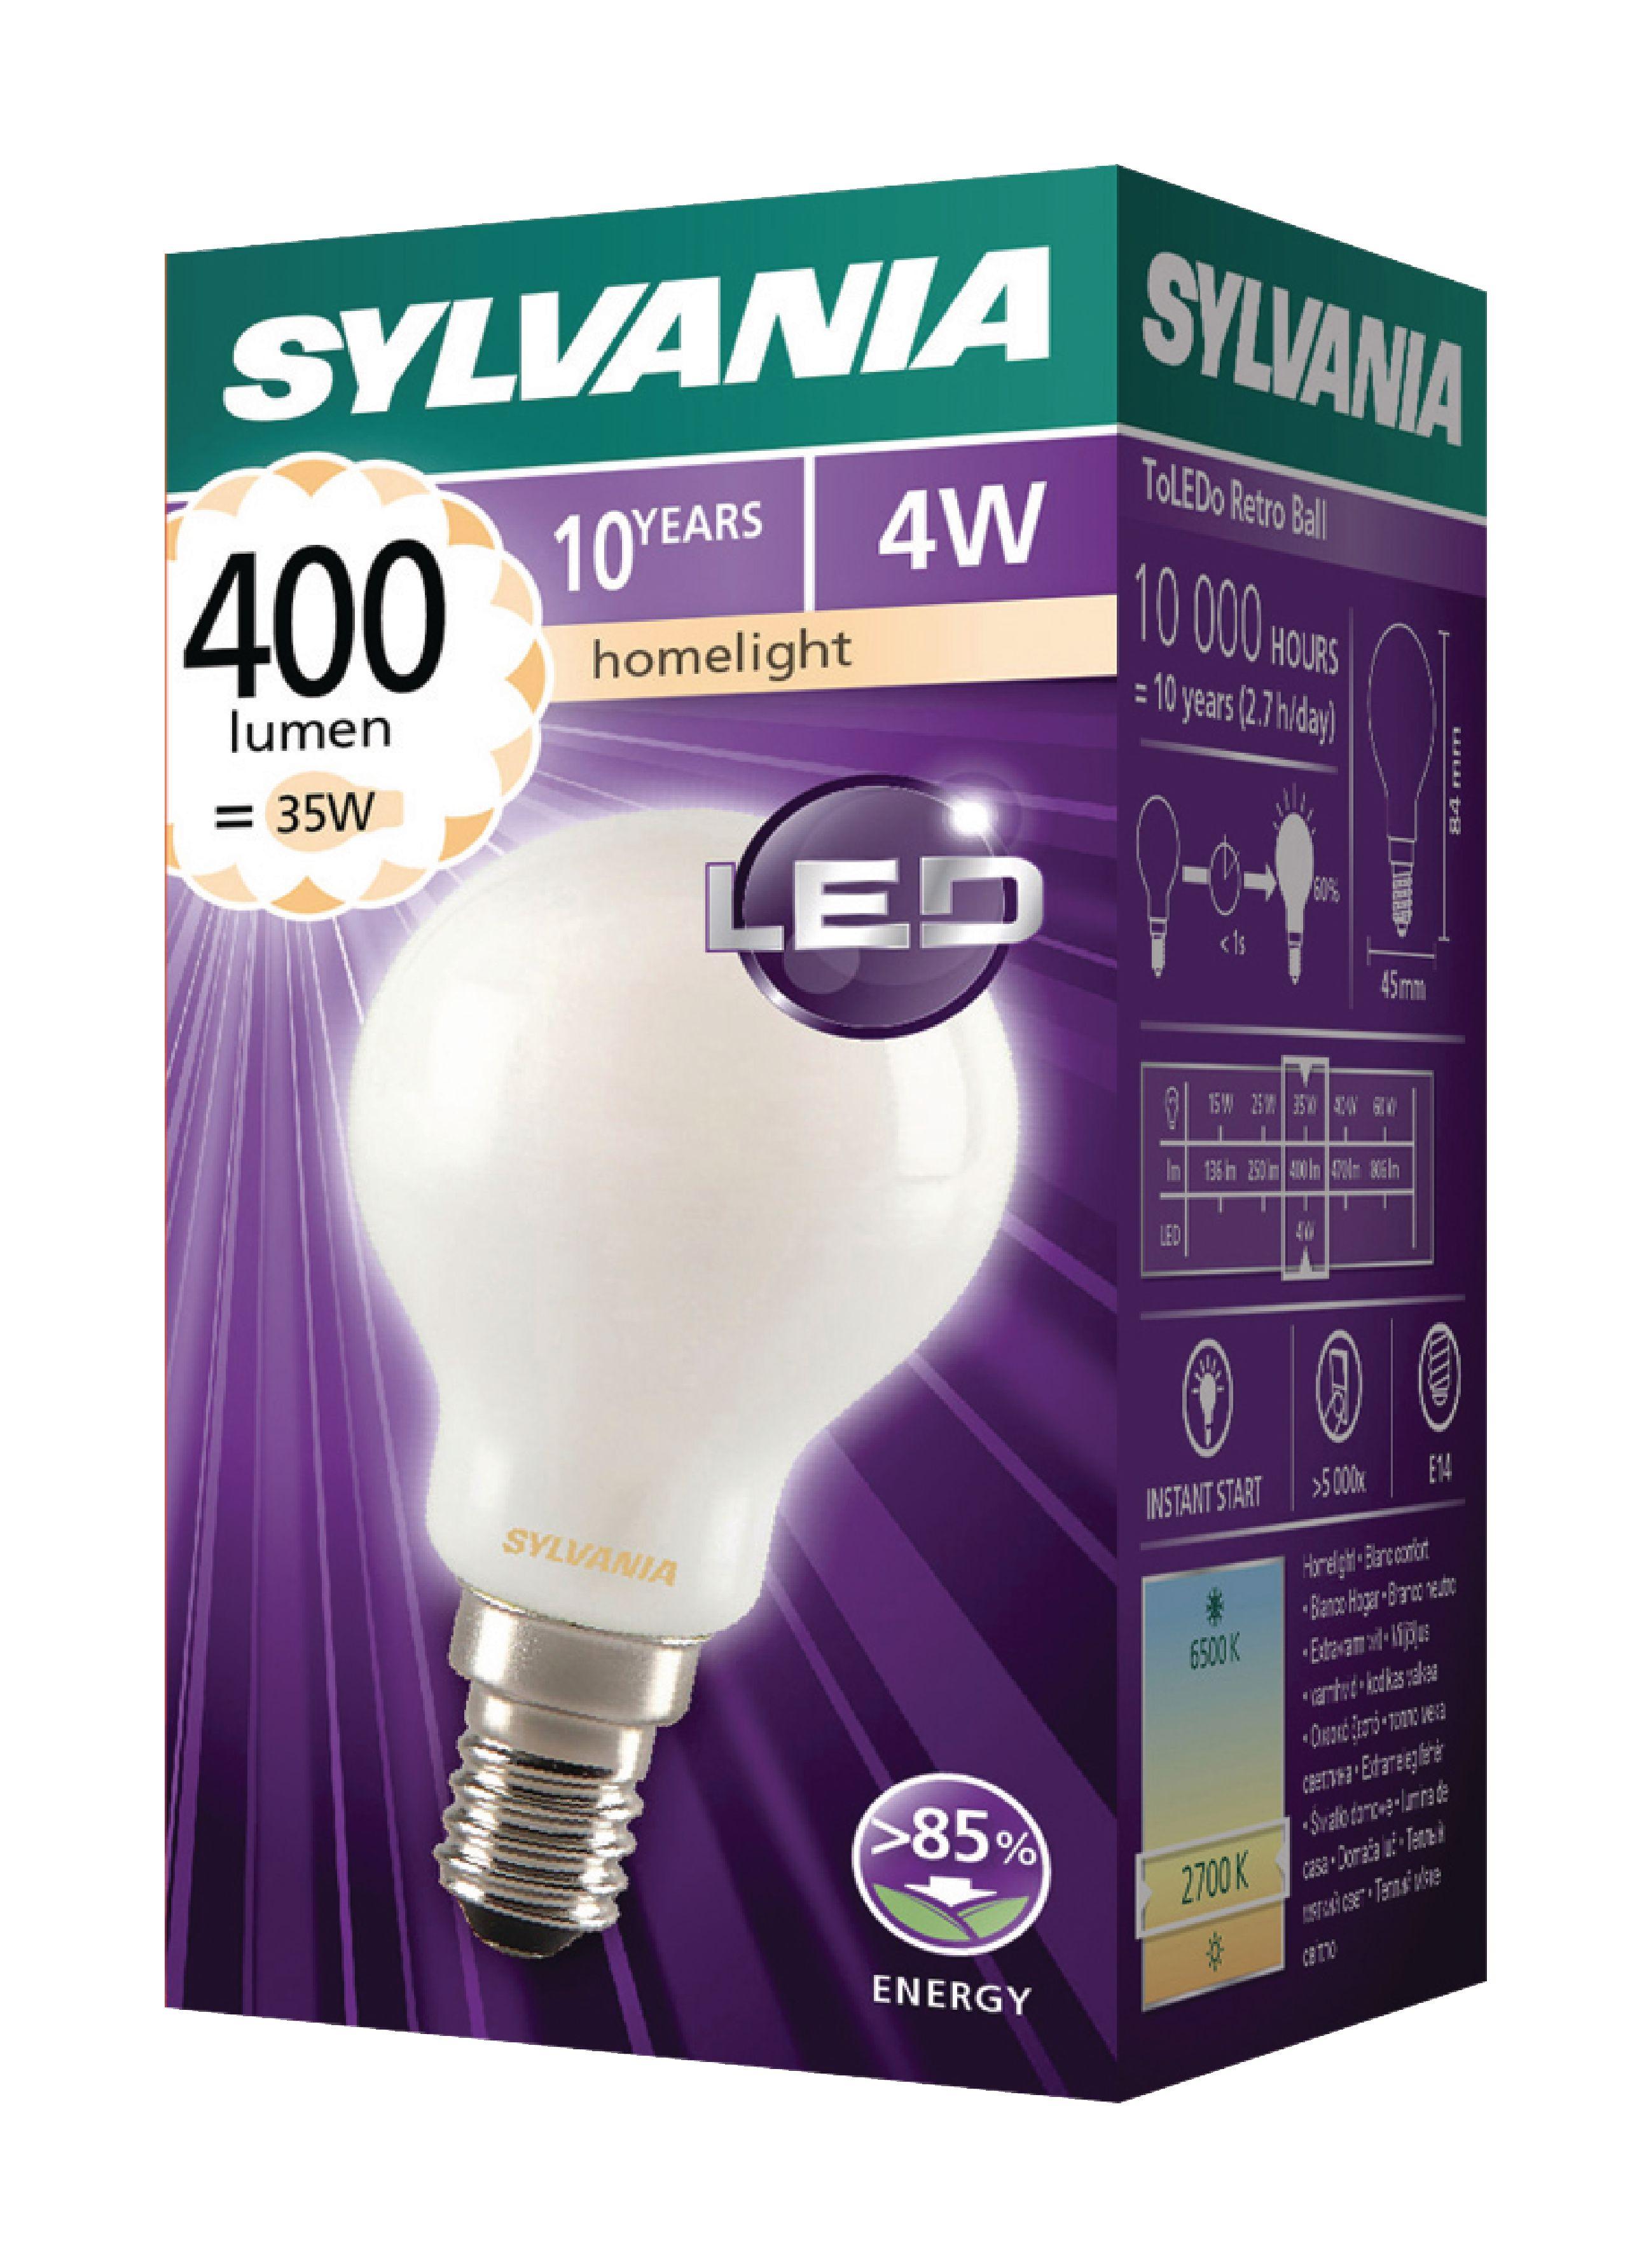 SYL-0027257_7 Faszinierend Led E14 400 Lumen Dekorationen